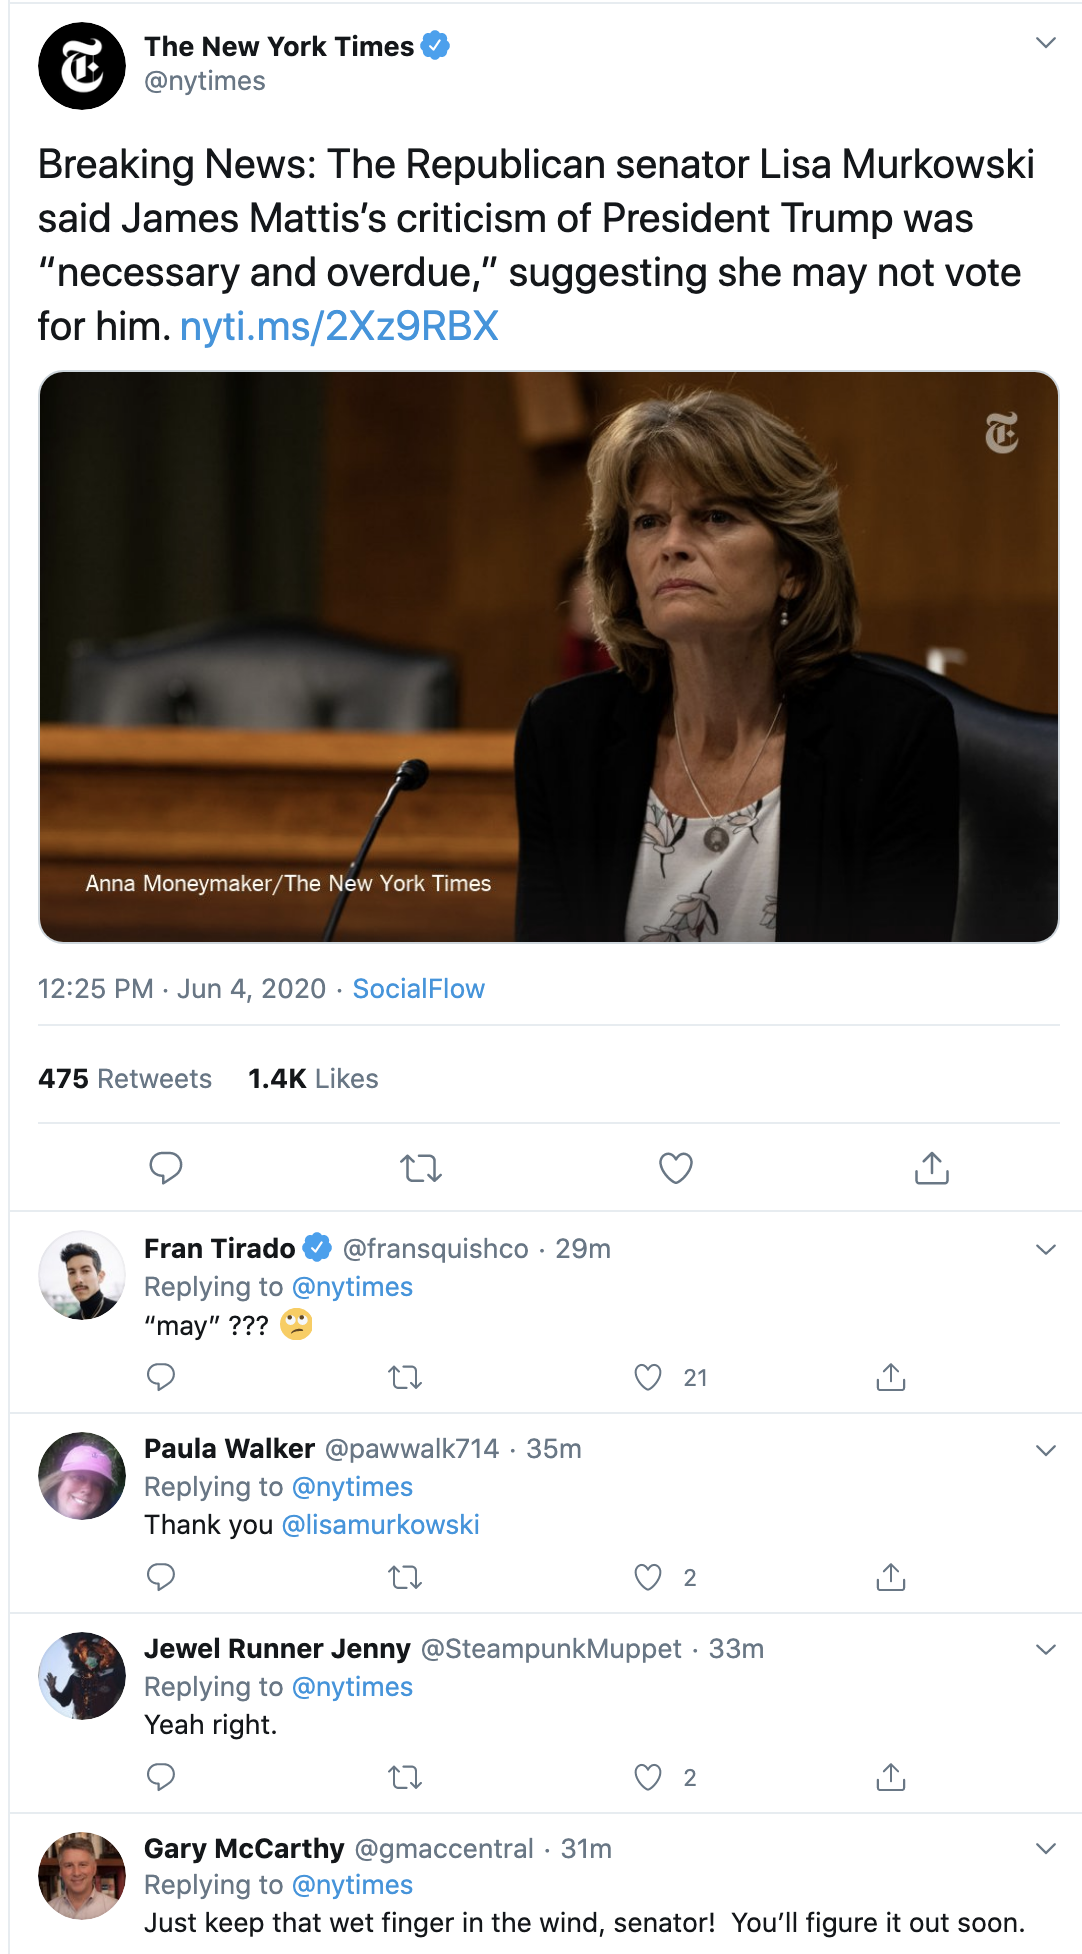 Screen-Shot-2020-06-04-at-1.01.48-PM GOP Senator Signals Possible No Vote For Trump In 2020 Corruption Featured Military Politics Top Stories